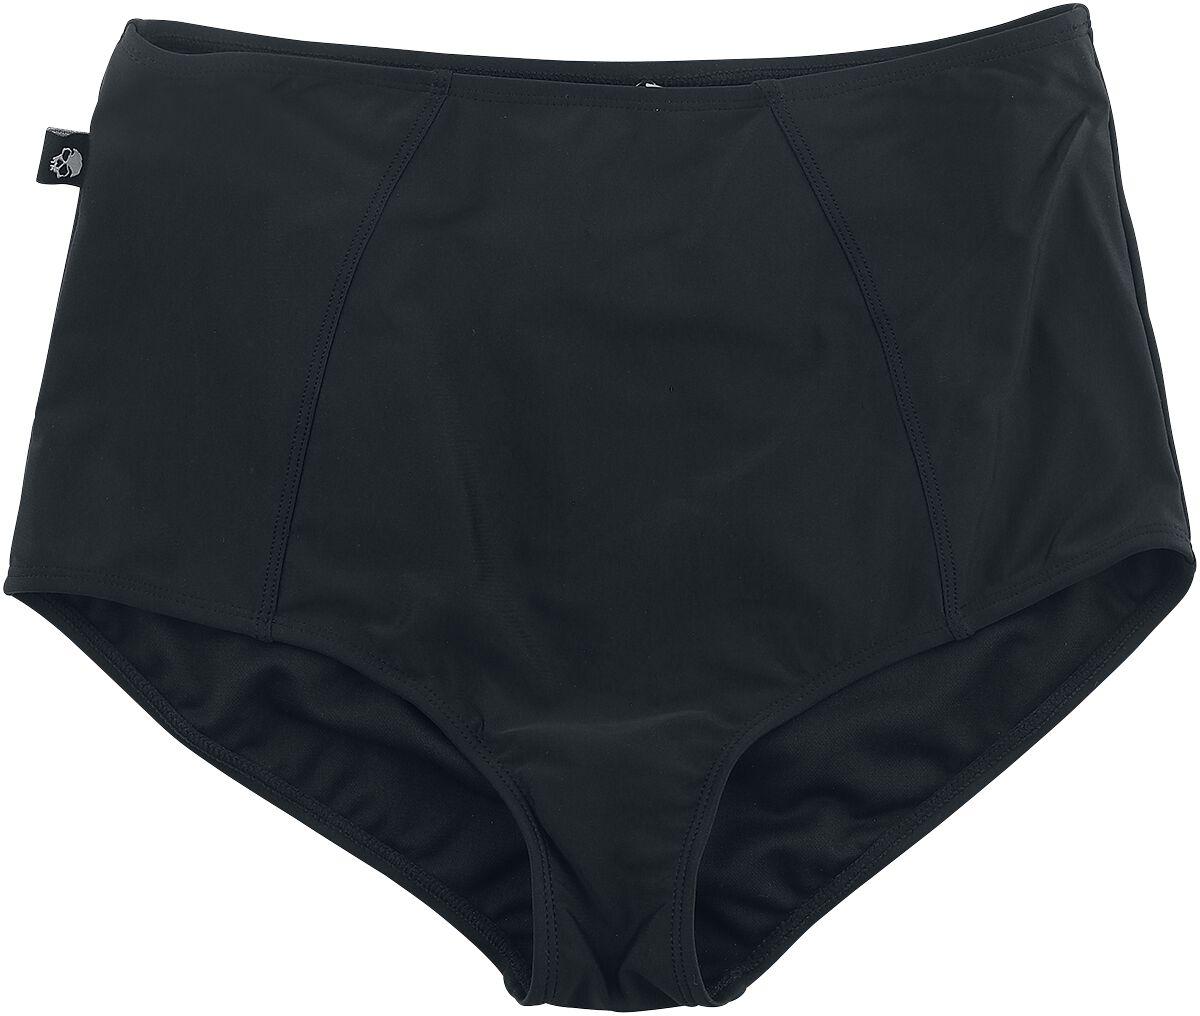 Image of Black Premium by EMP Schwarze High Waist Bikinihose Bikini-Slip schwarz